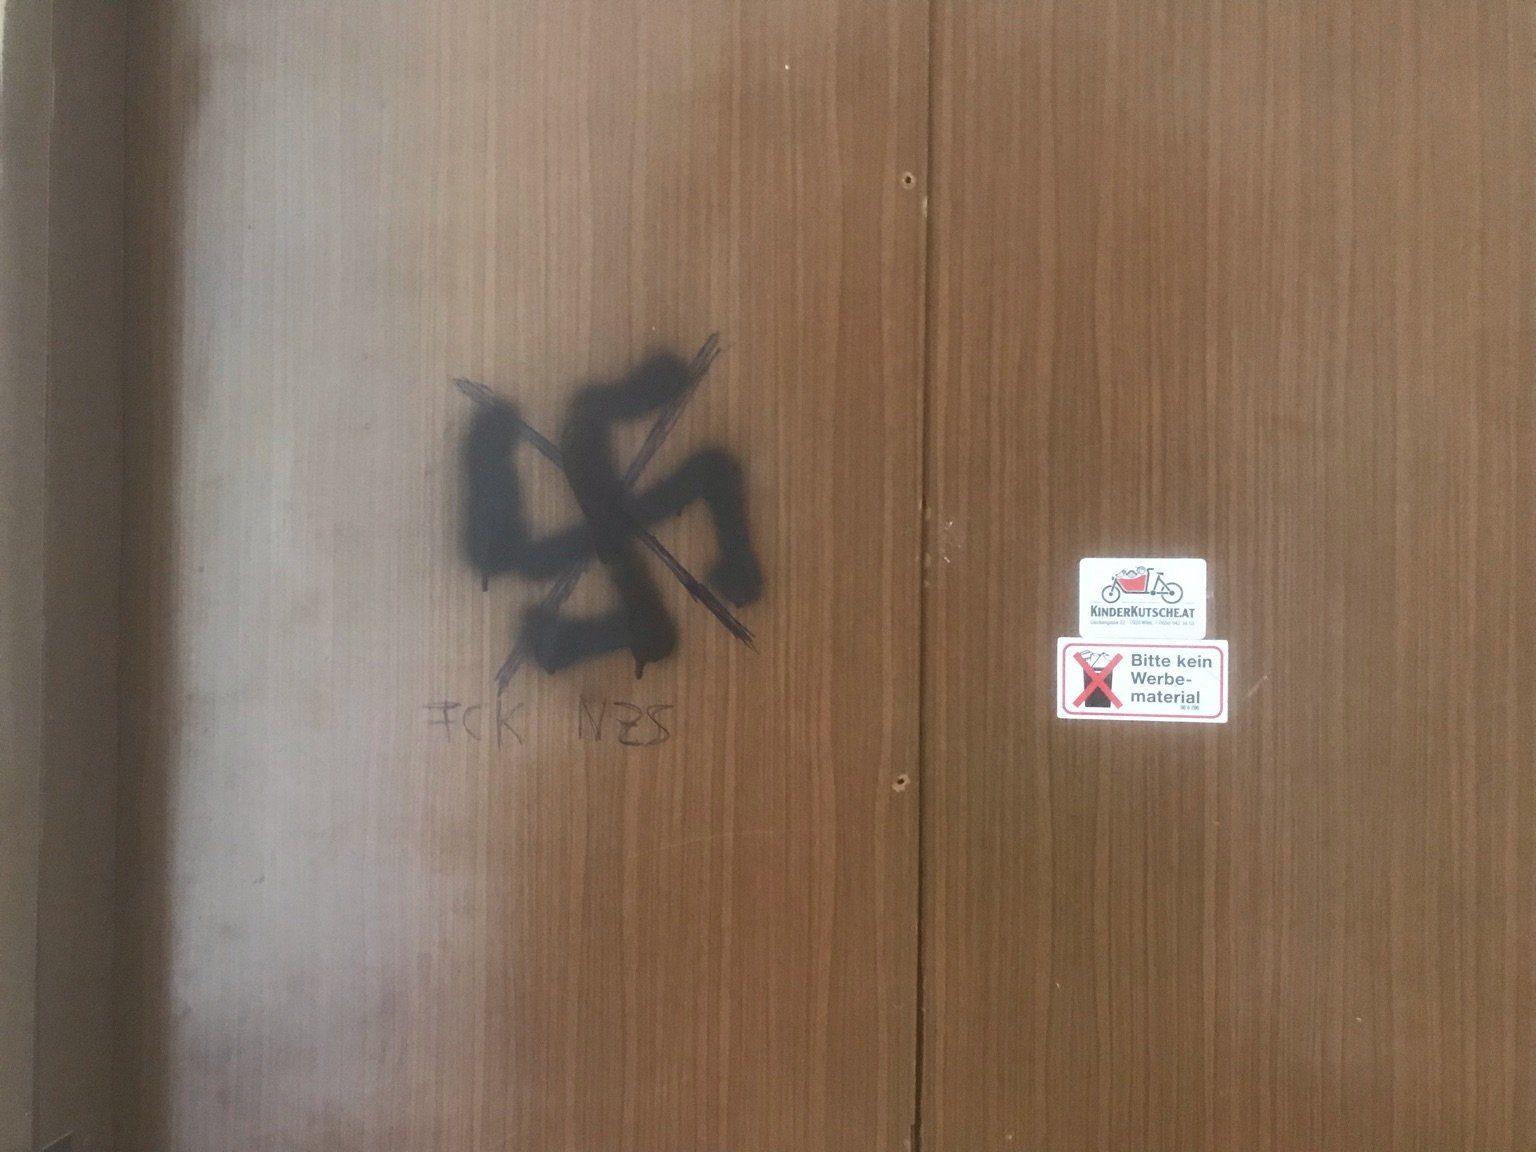 Hakenkreuz am Gang eines Hauses in der Glockengasse/Wien (Foto © privat)